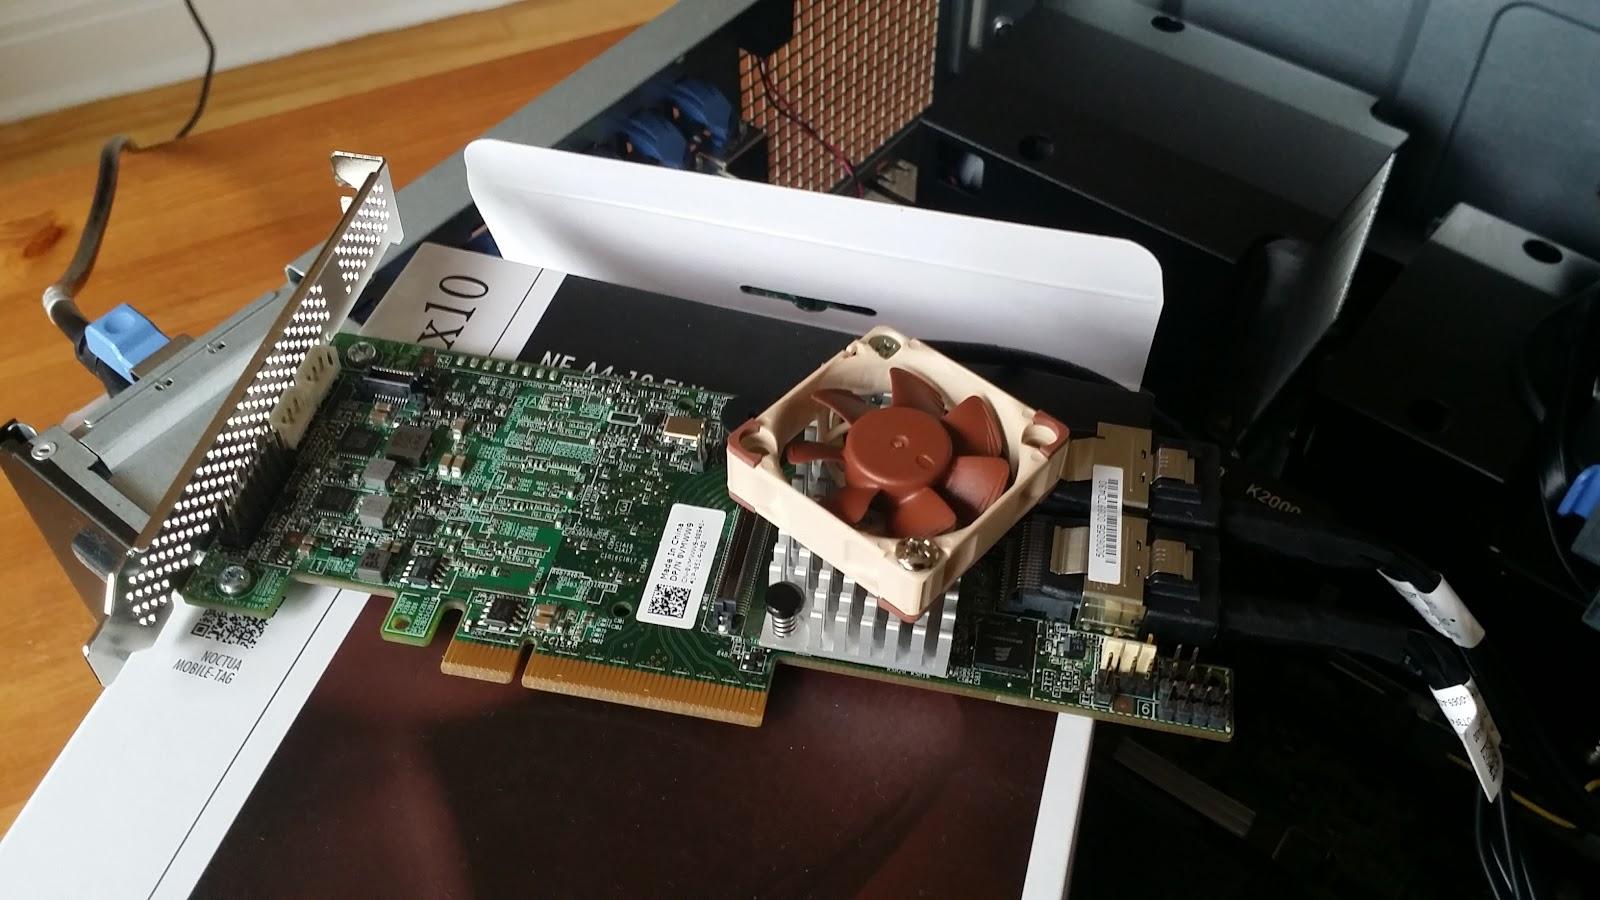 Coyote's Blog: LSI MegaRaid HBA's, overheating and one ugly hack